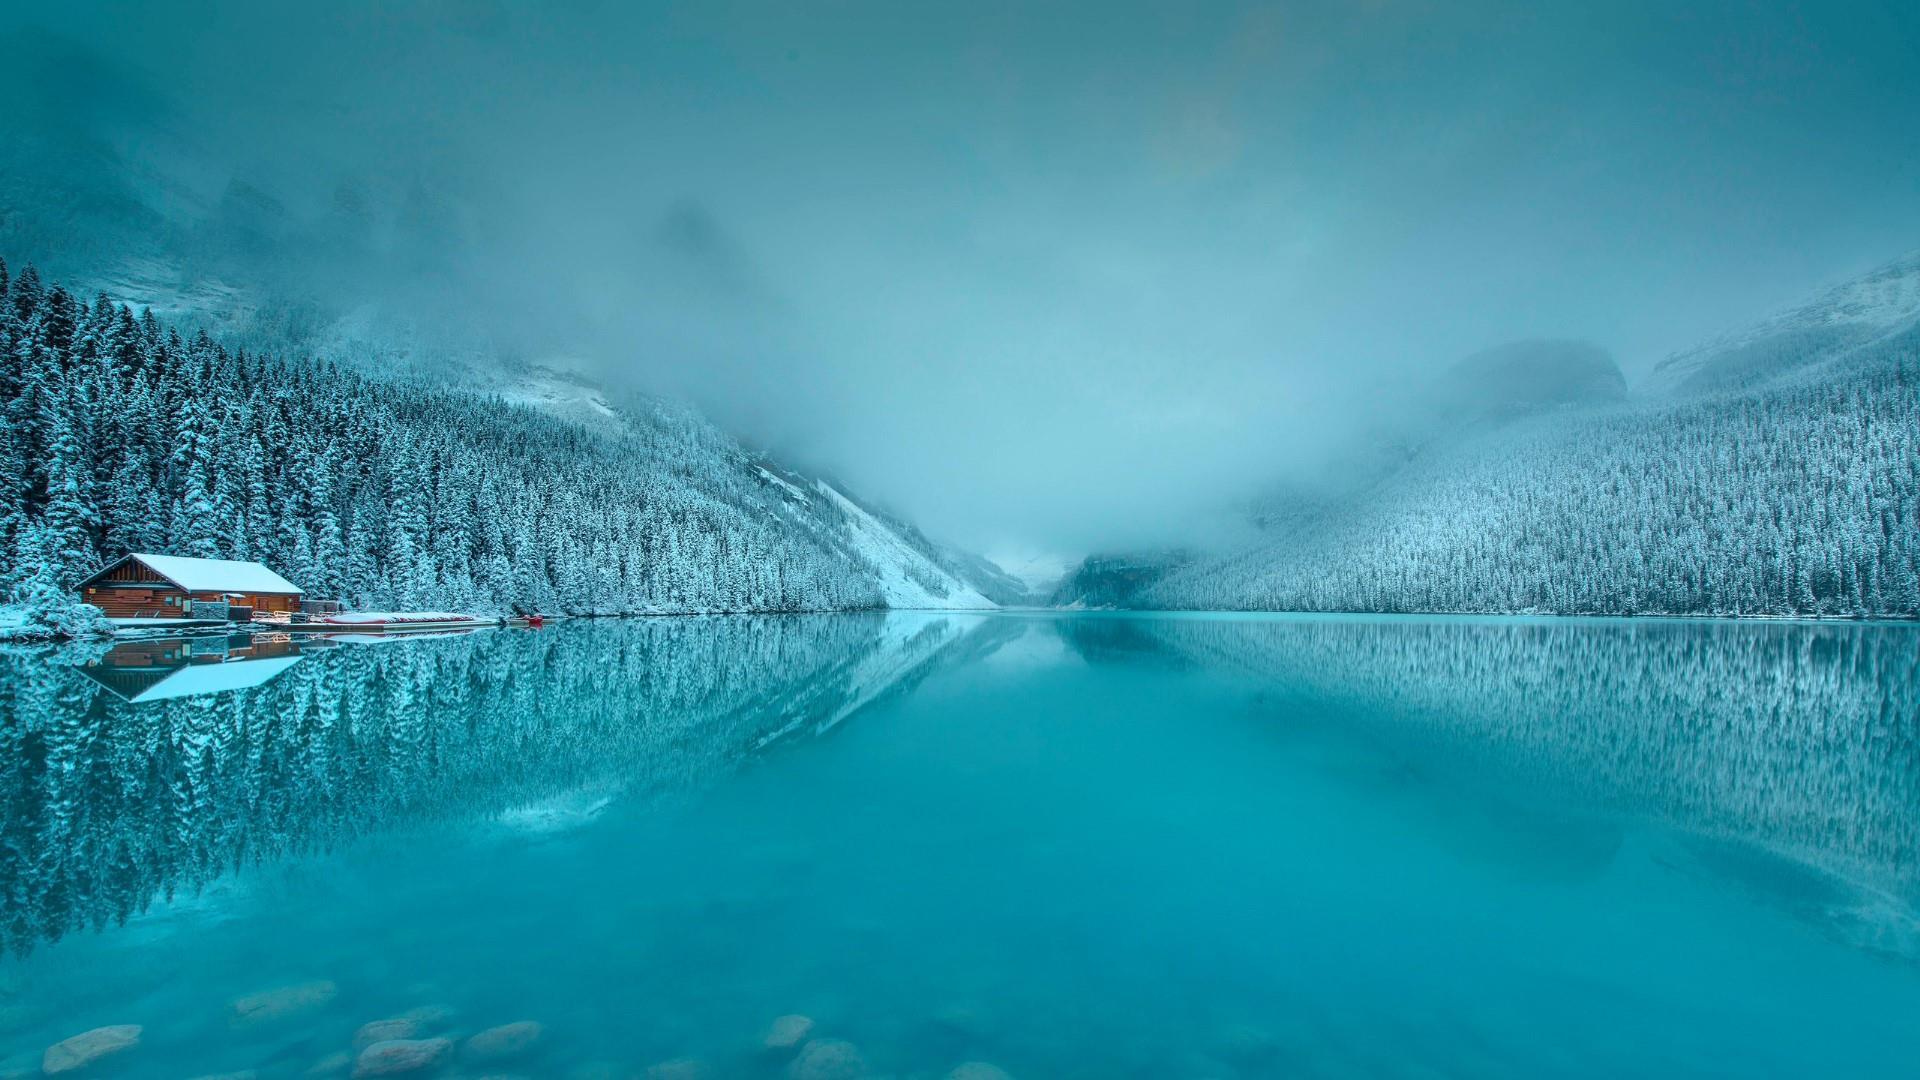 Lake Louise in winter (Banff National Park) wallpaper